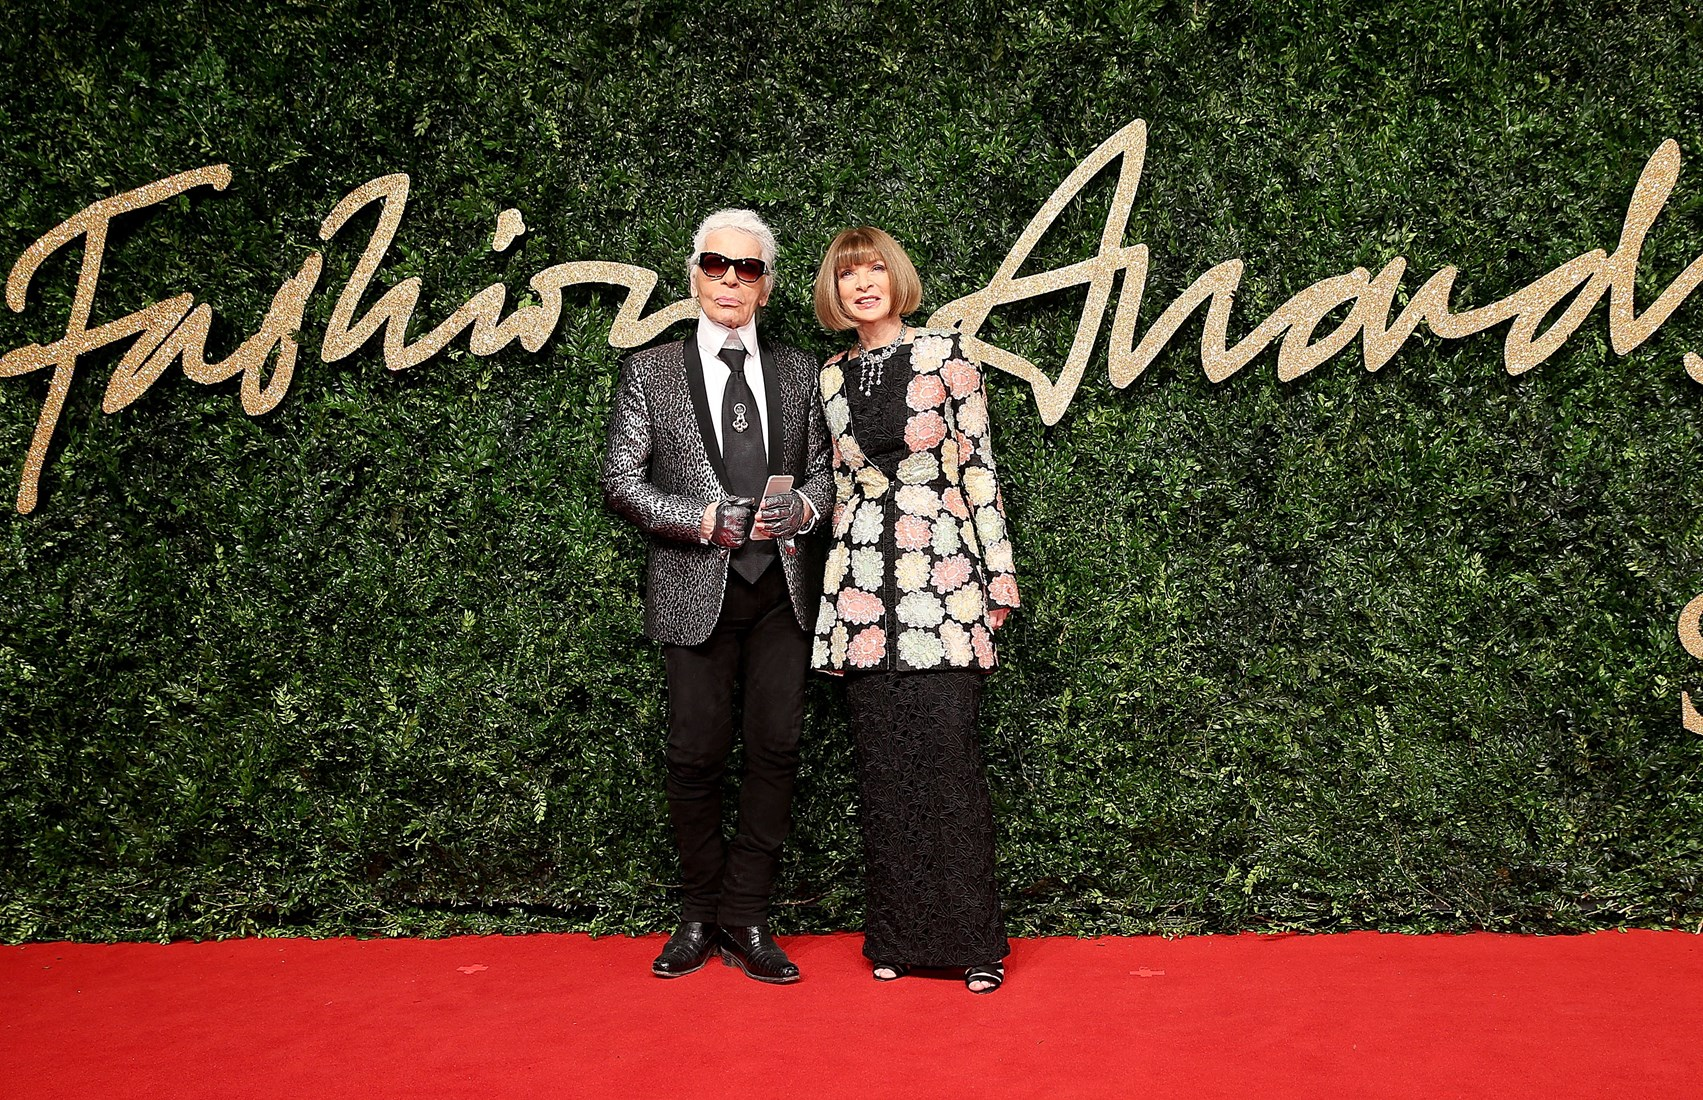 Image source: British Fashion Awards